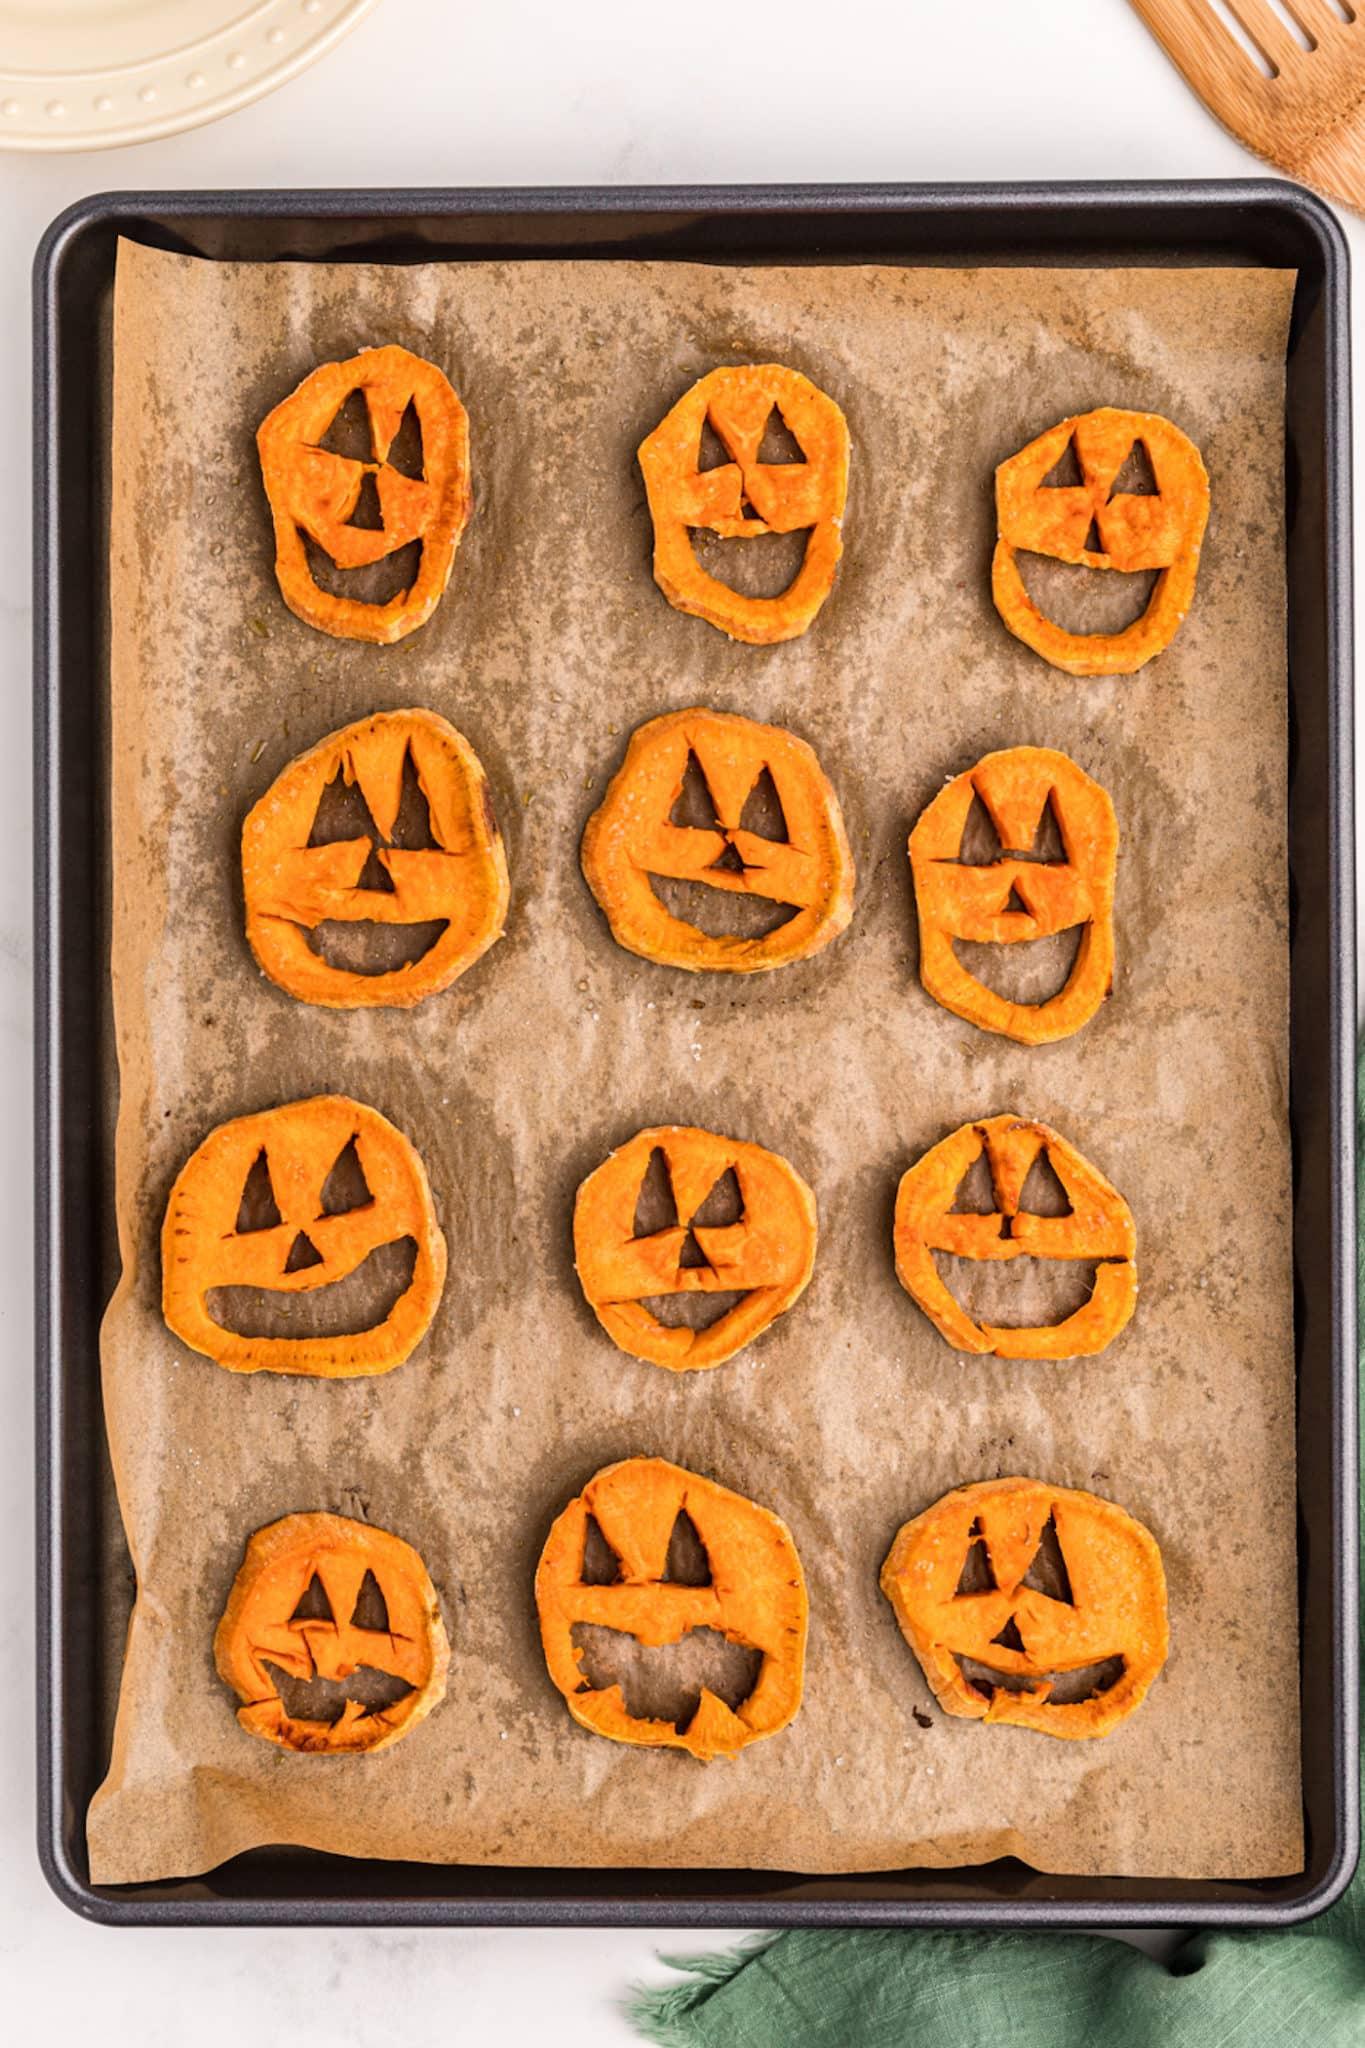 baked sweet potato jack o lanterns on a baking sheet